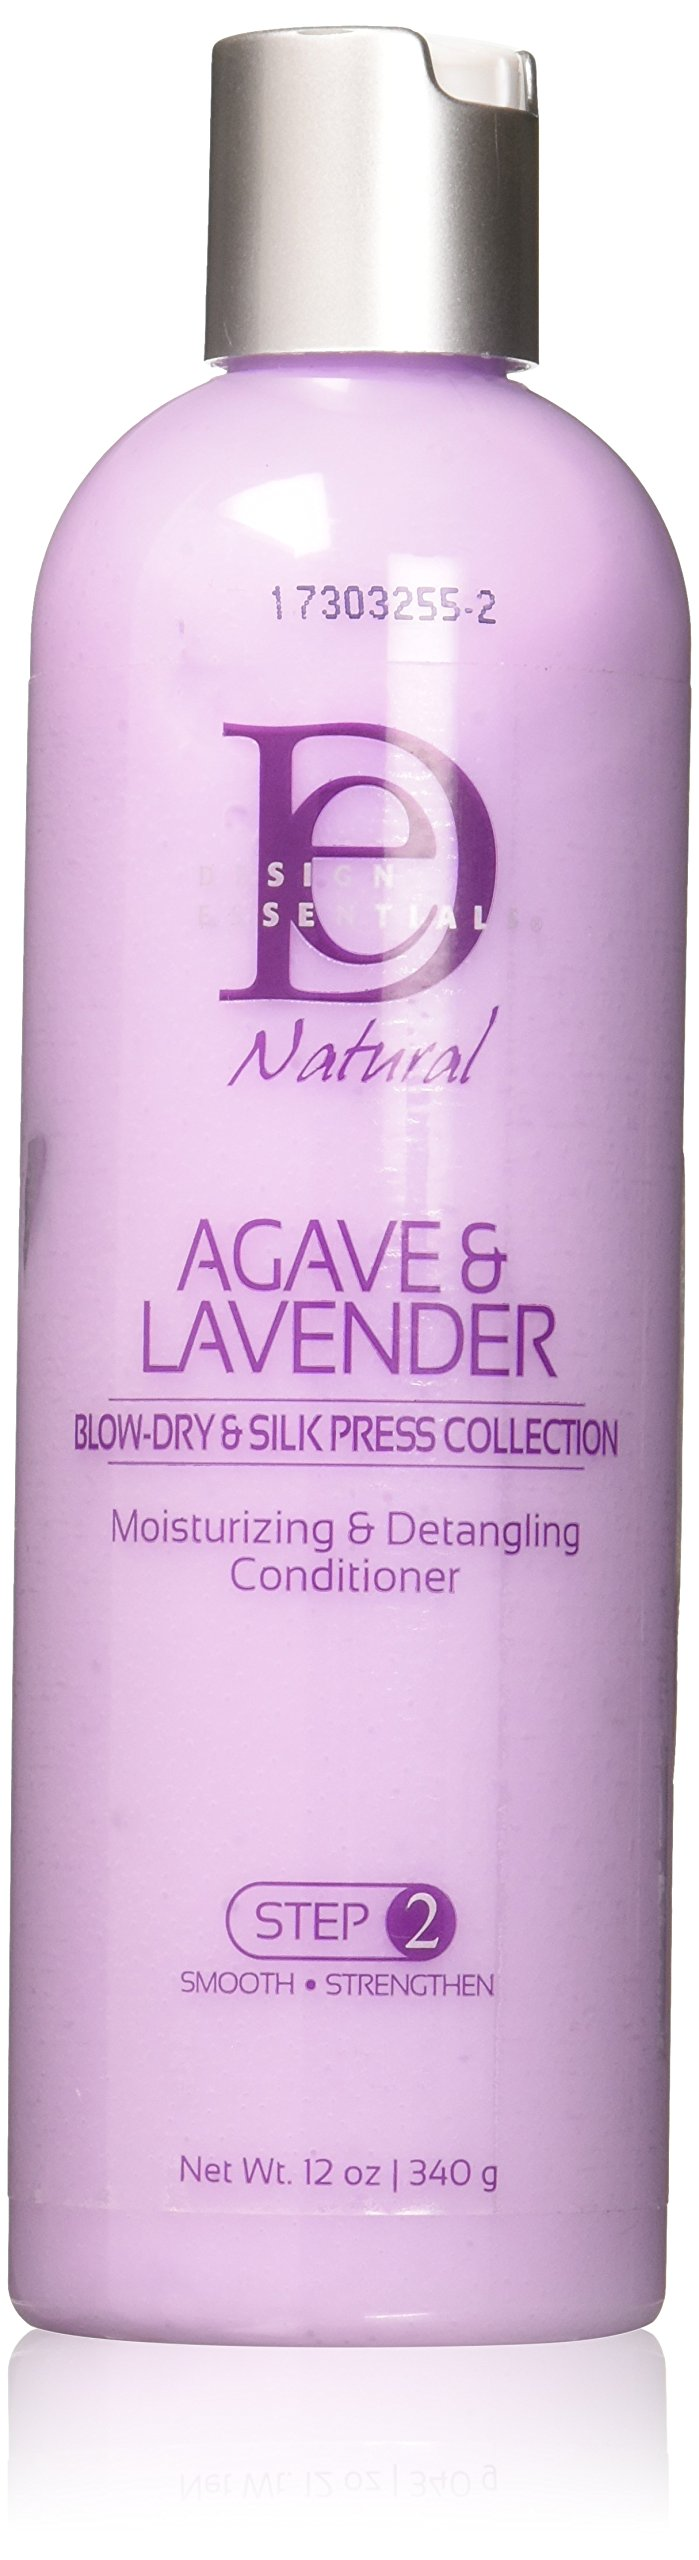 Amazoncom Design Essentials Agave Lavender Thermal Protectant